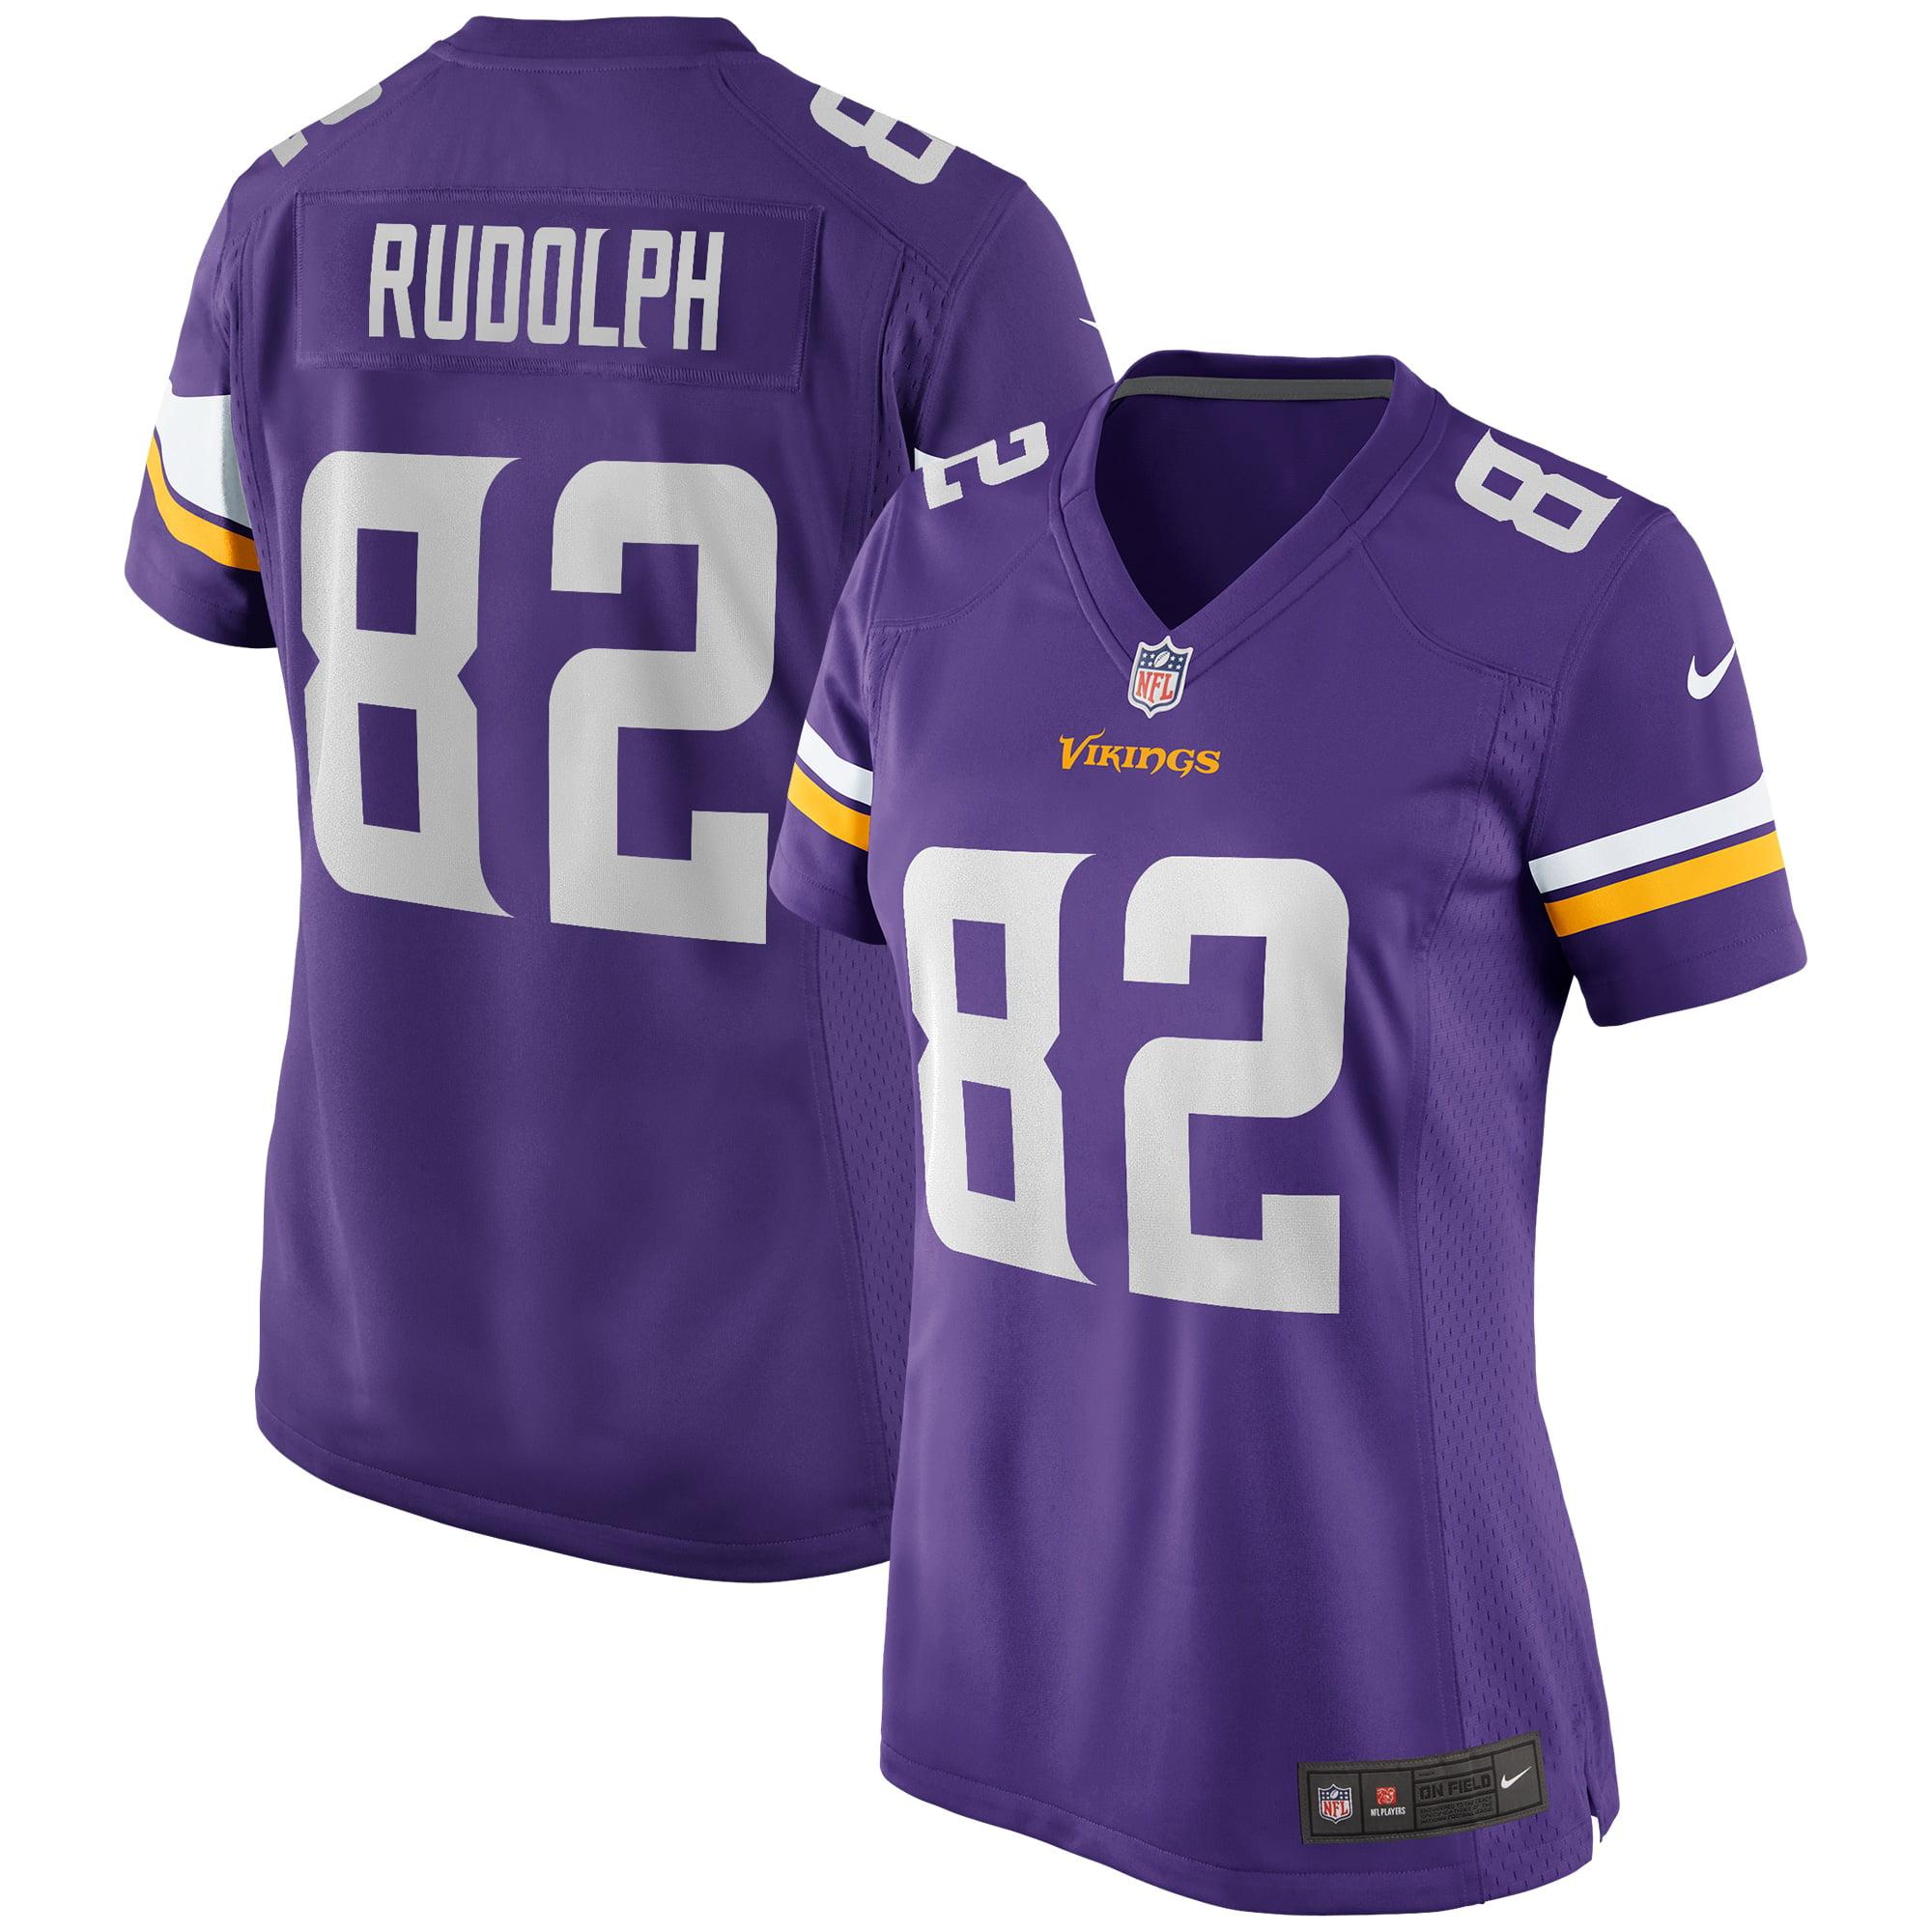 Kyle Rudolph Minnesota Vikings Nike Women's Game Jersey - Purple - Walmart.com